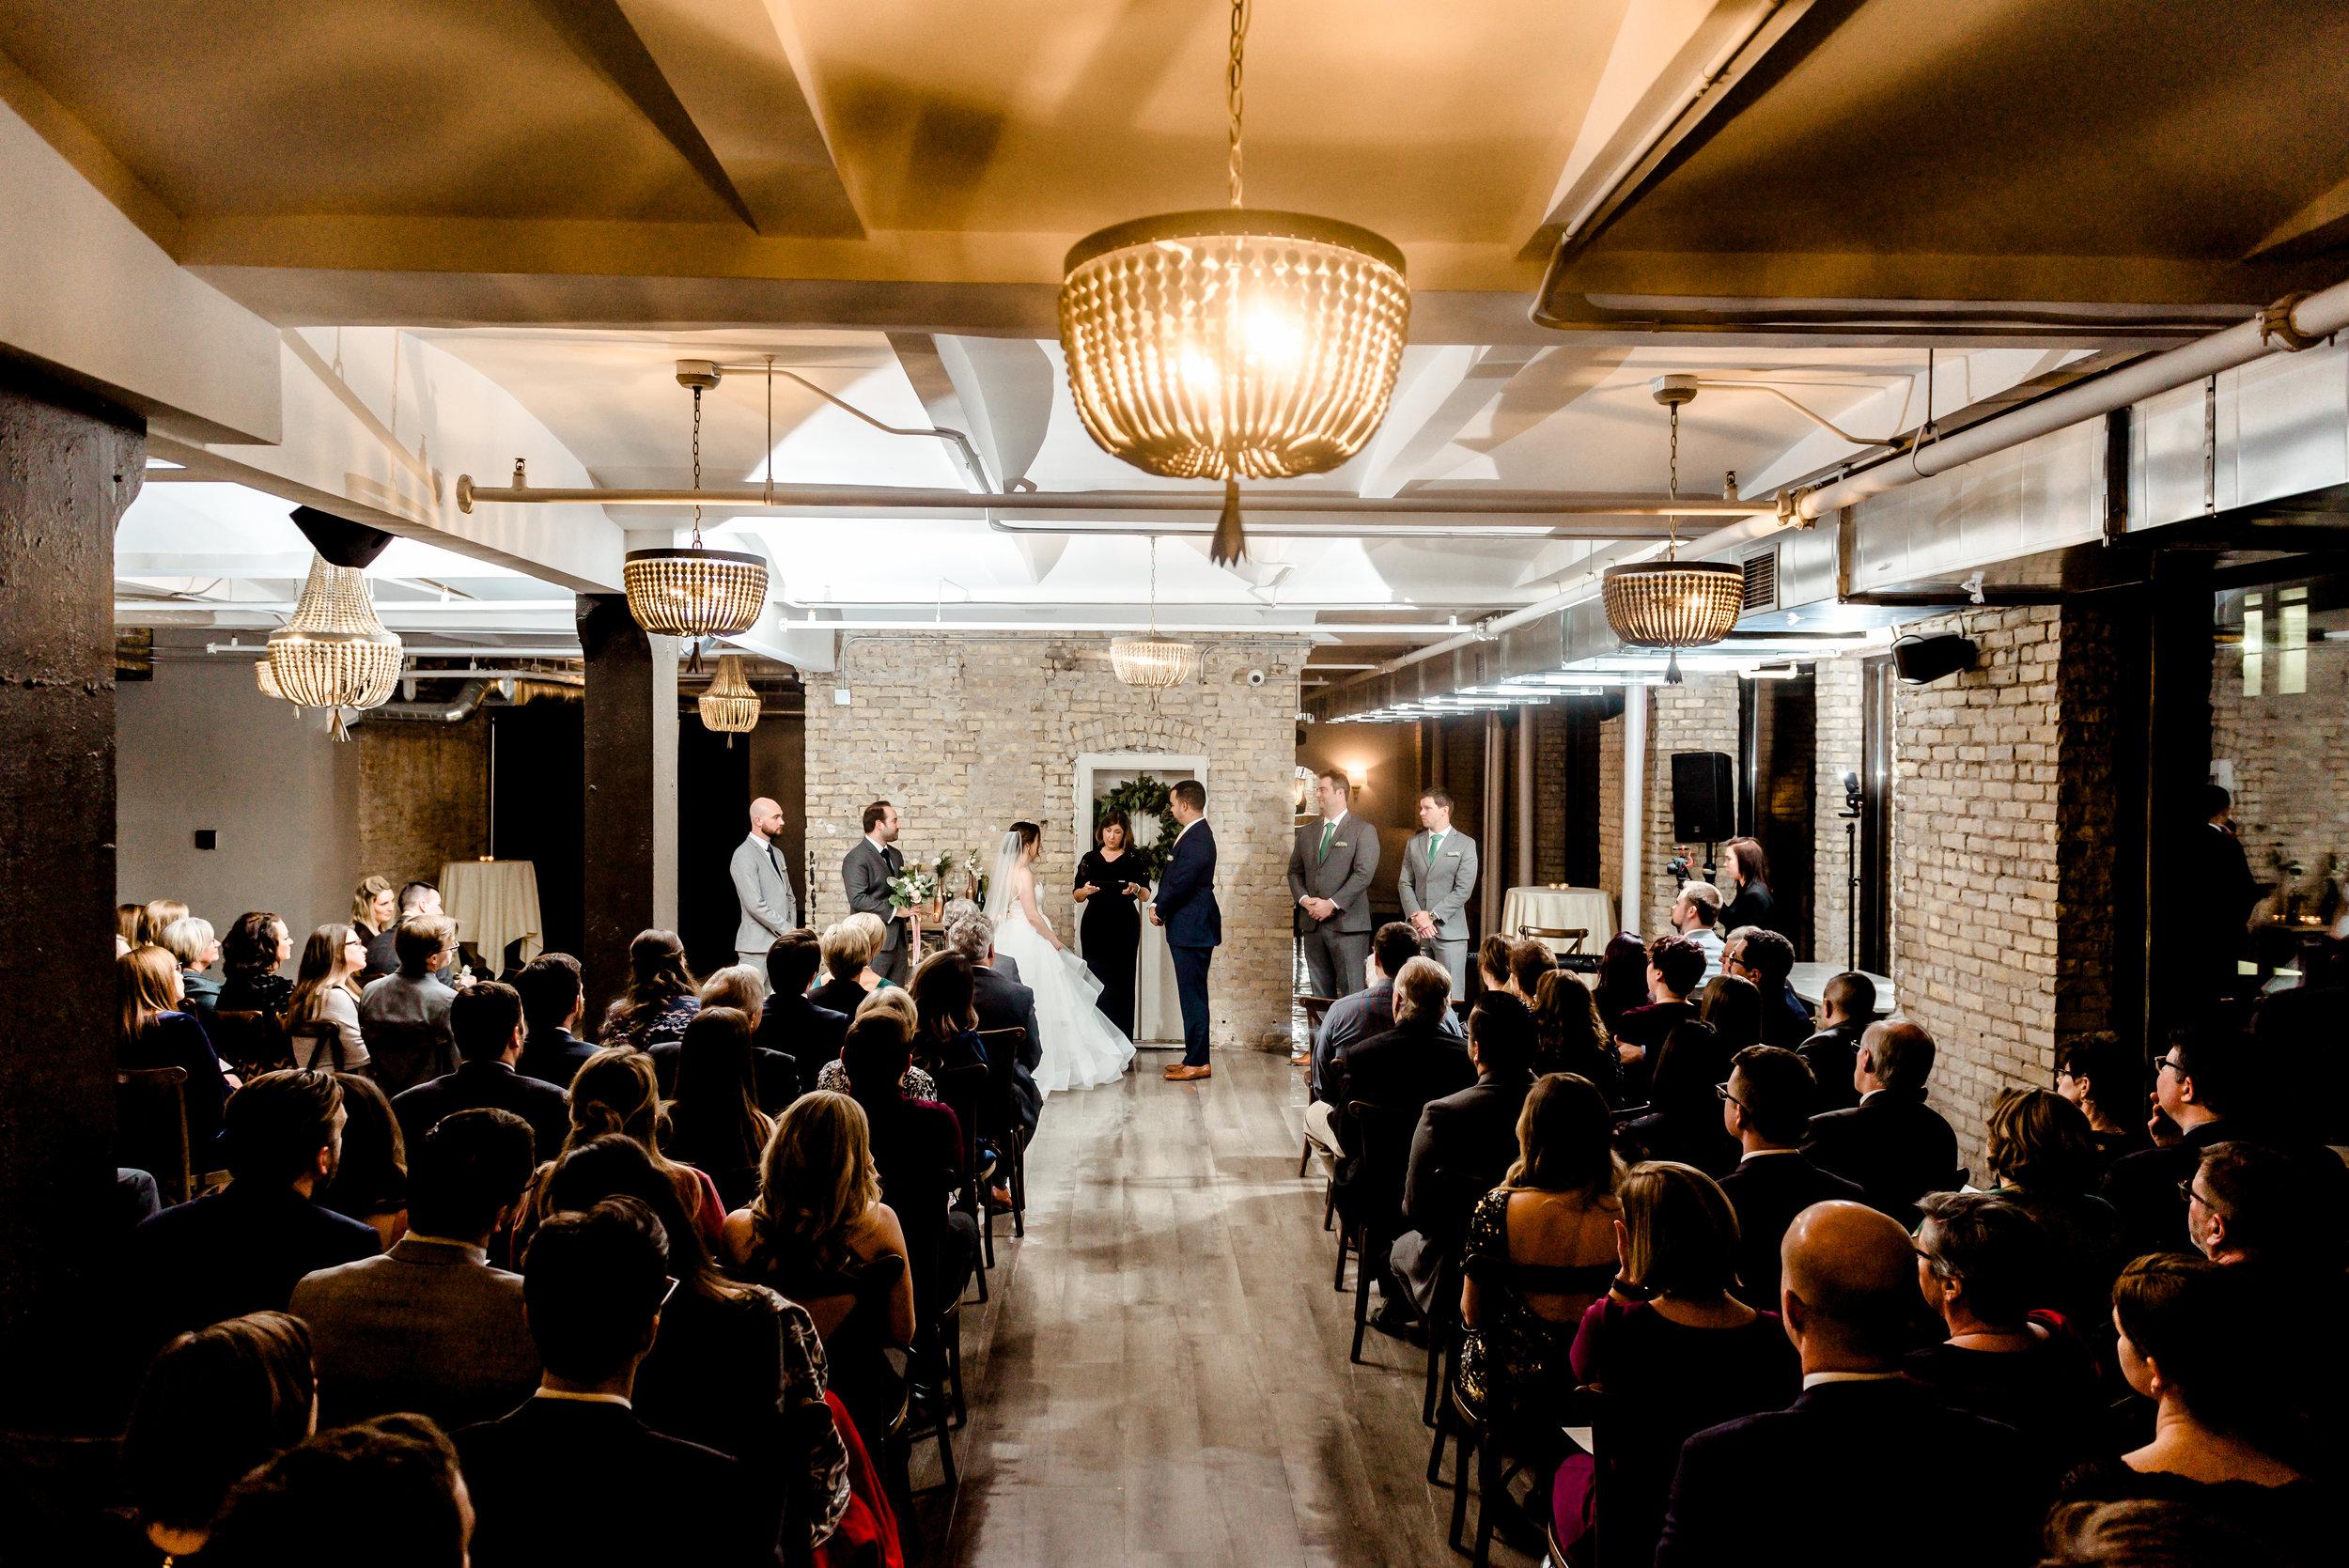 Megan and Alec - Lumber Exchange Wedding Sawyer Dylan Room - Highlights-193.jpg